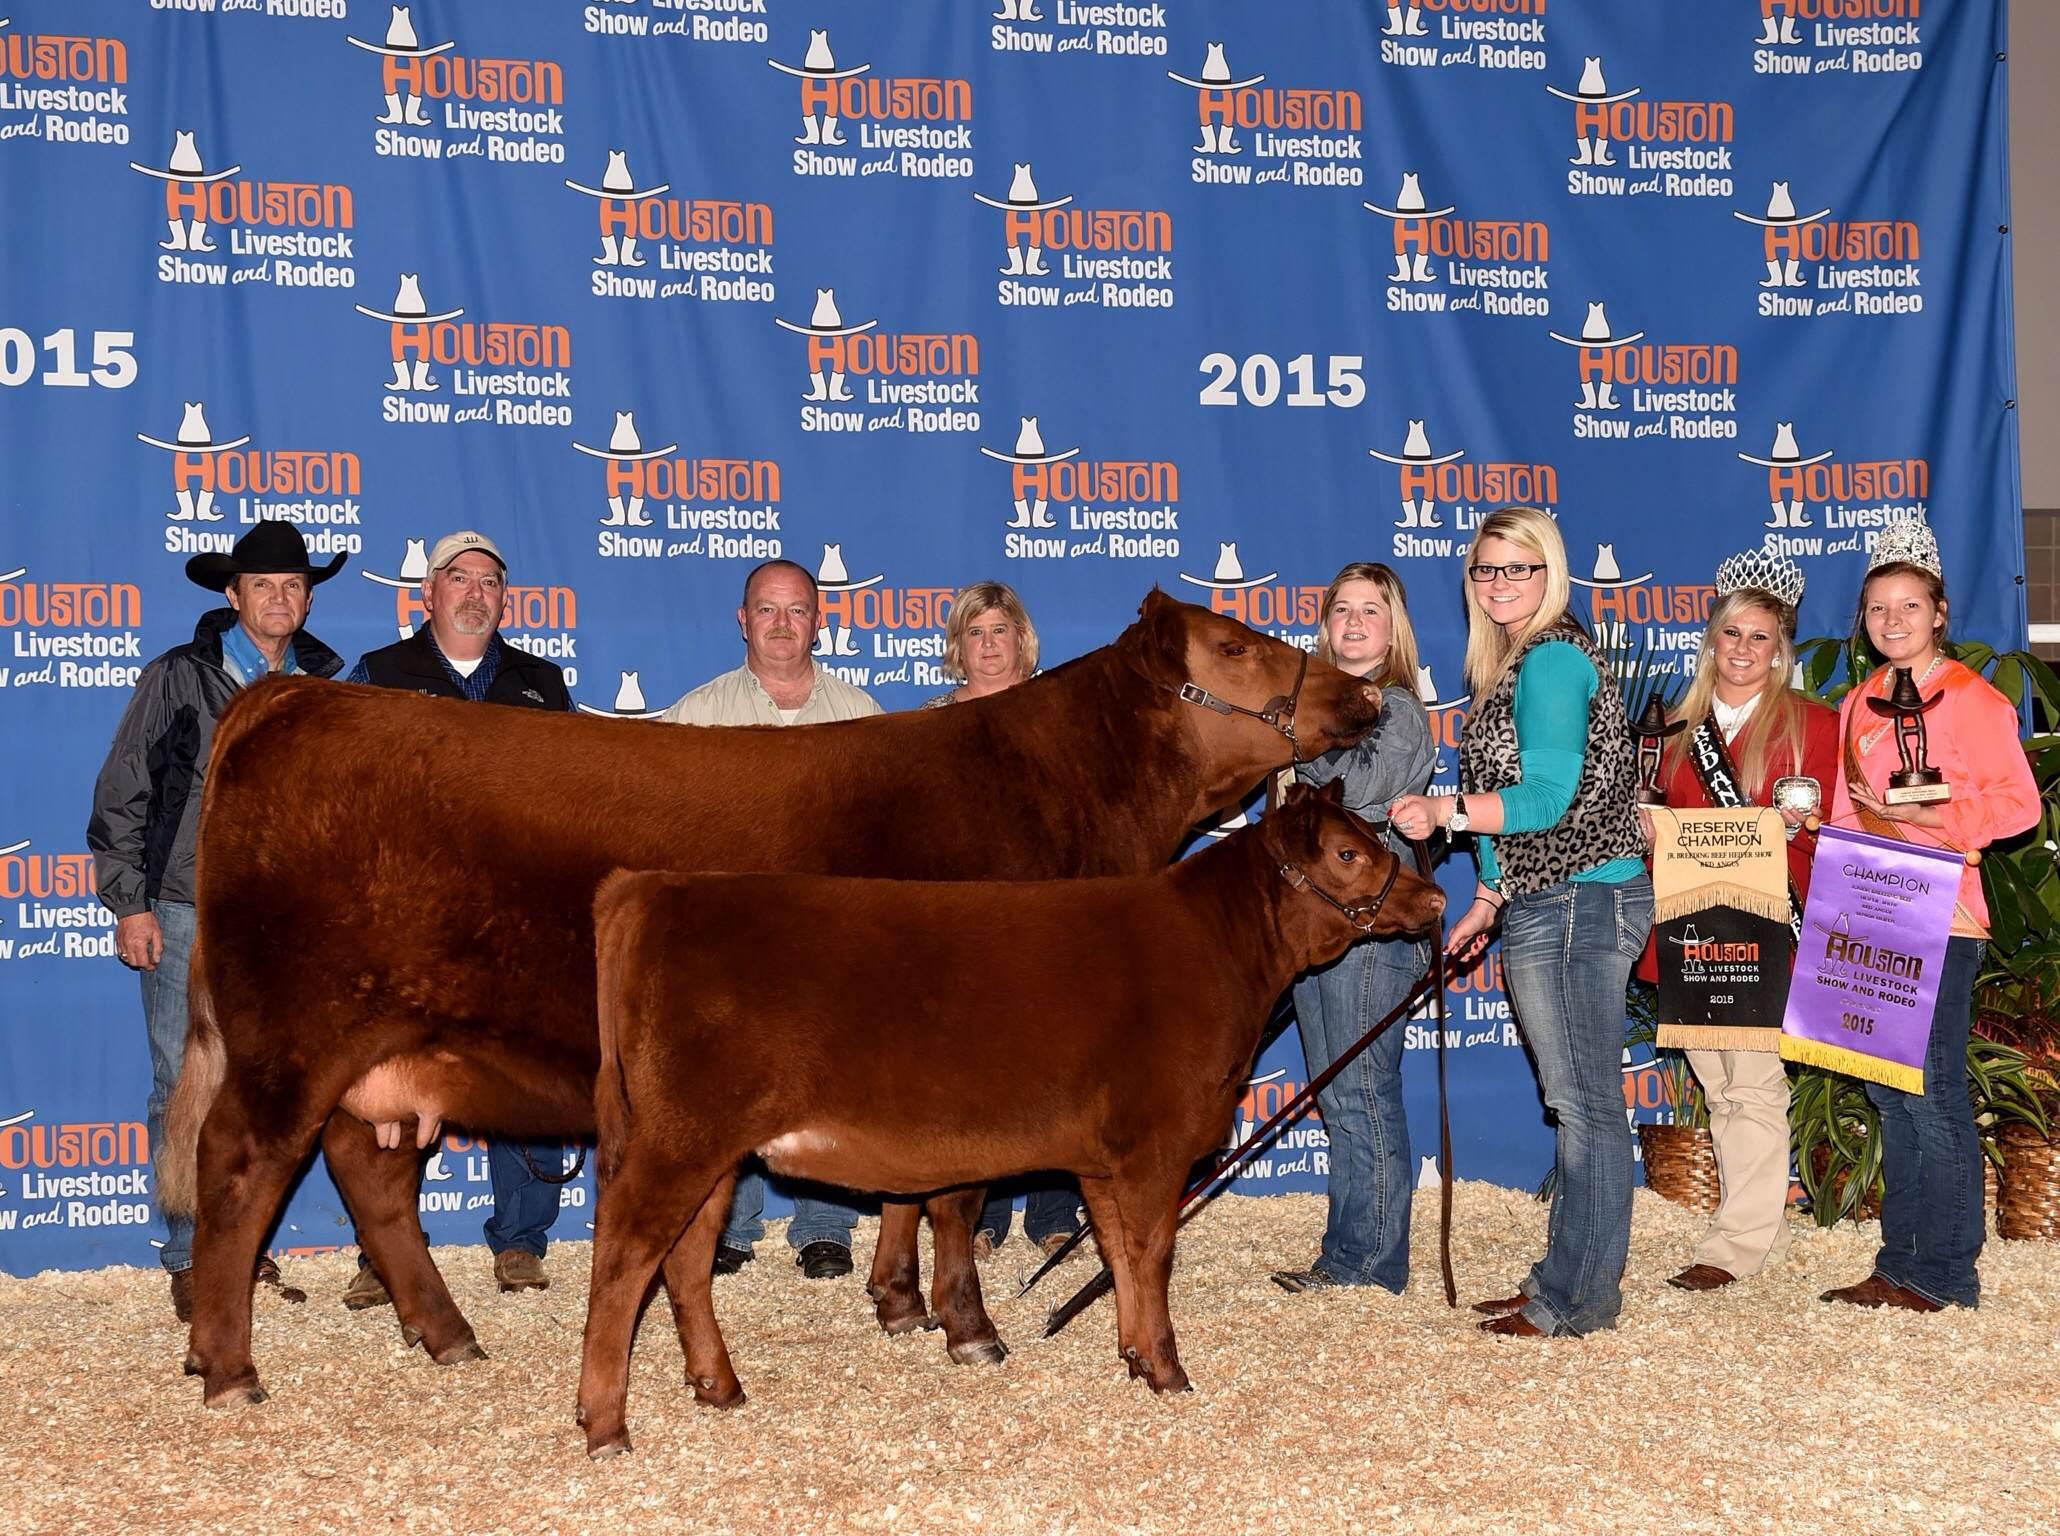 Houston Livestock Show